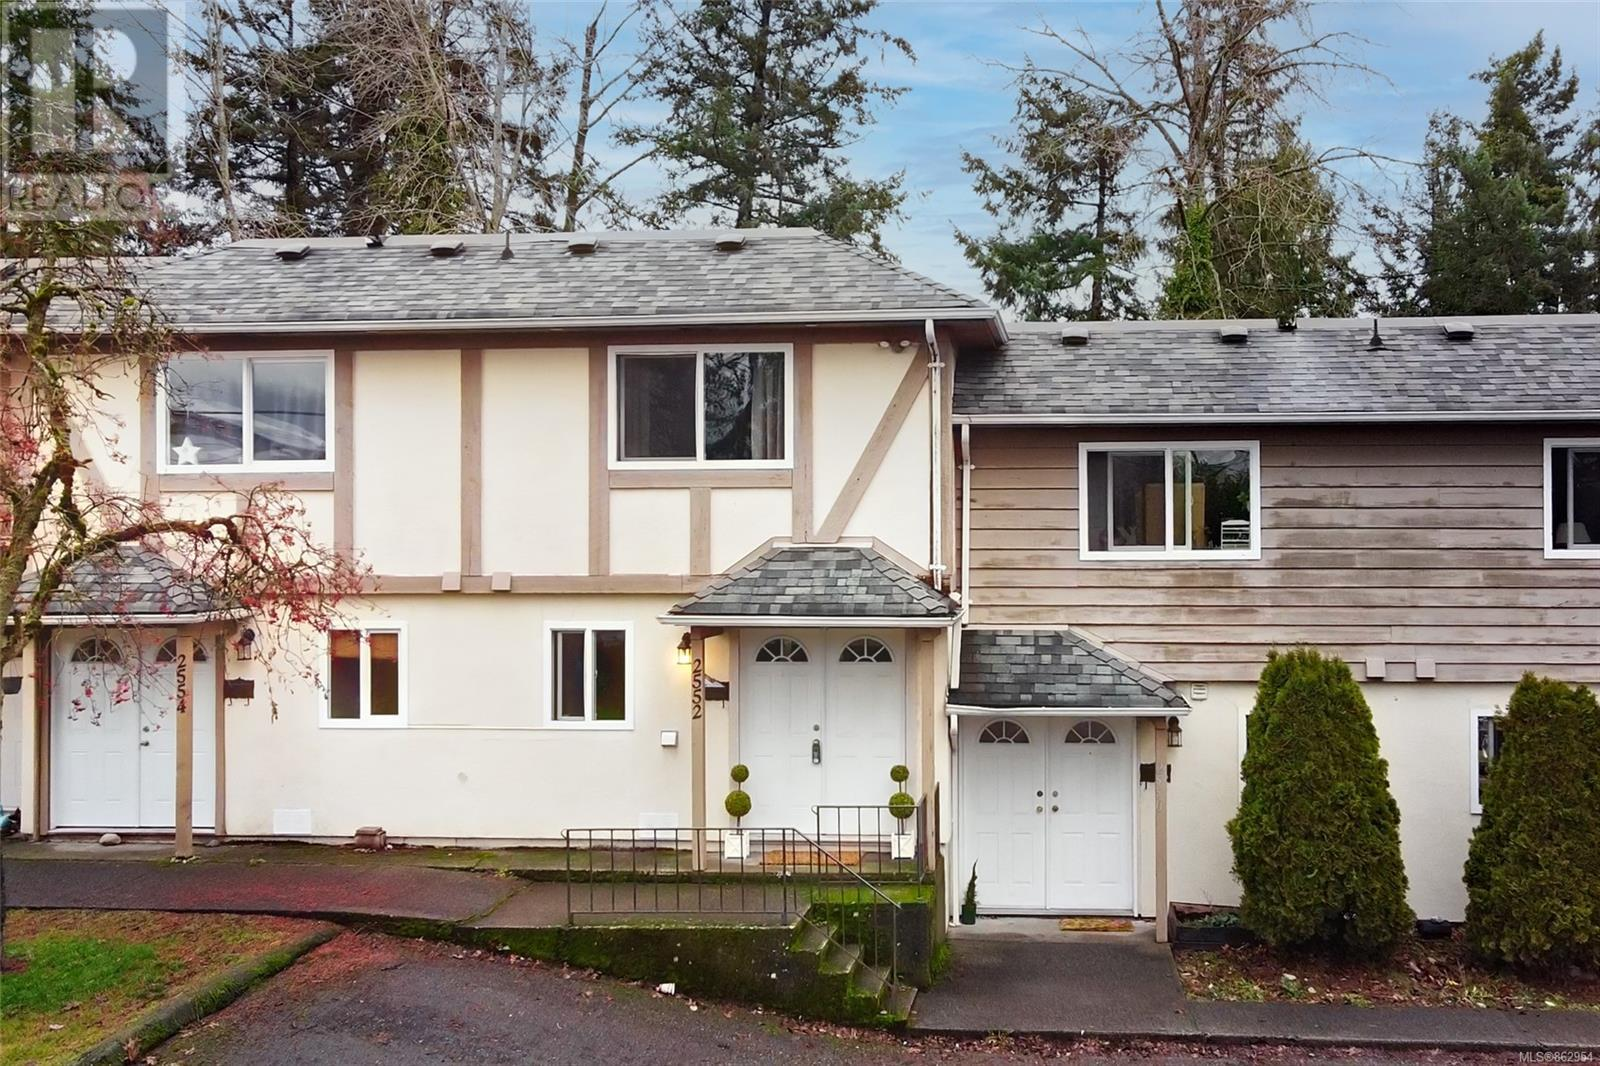 2552 Highland Blvd, Nanaimo, British Columbia  V9S 3N8 - Photo 2 - 862954